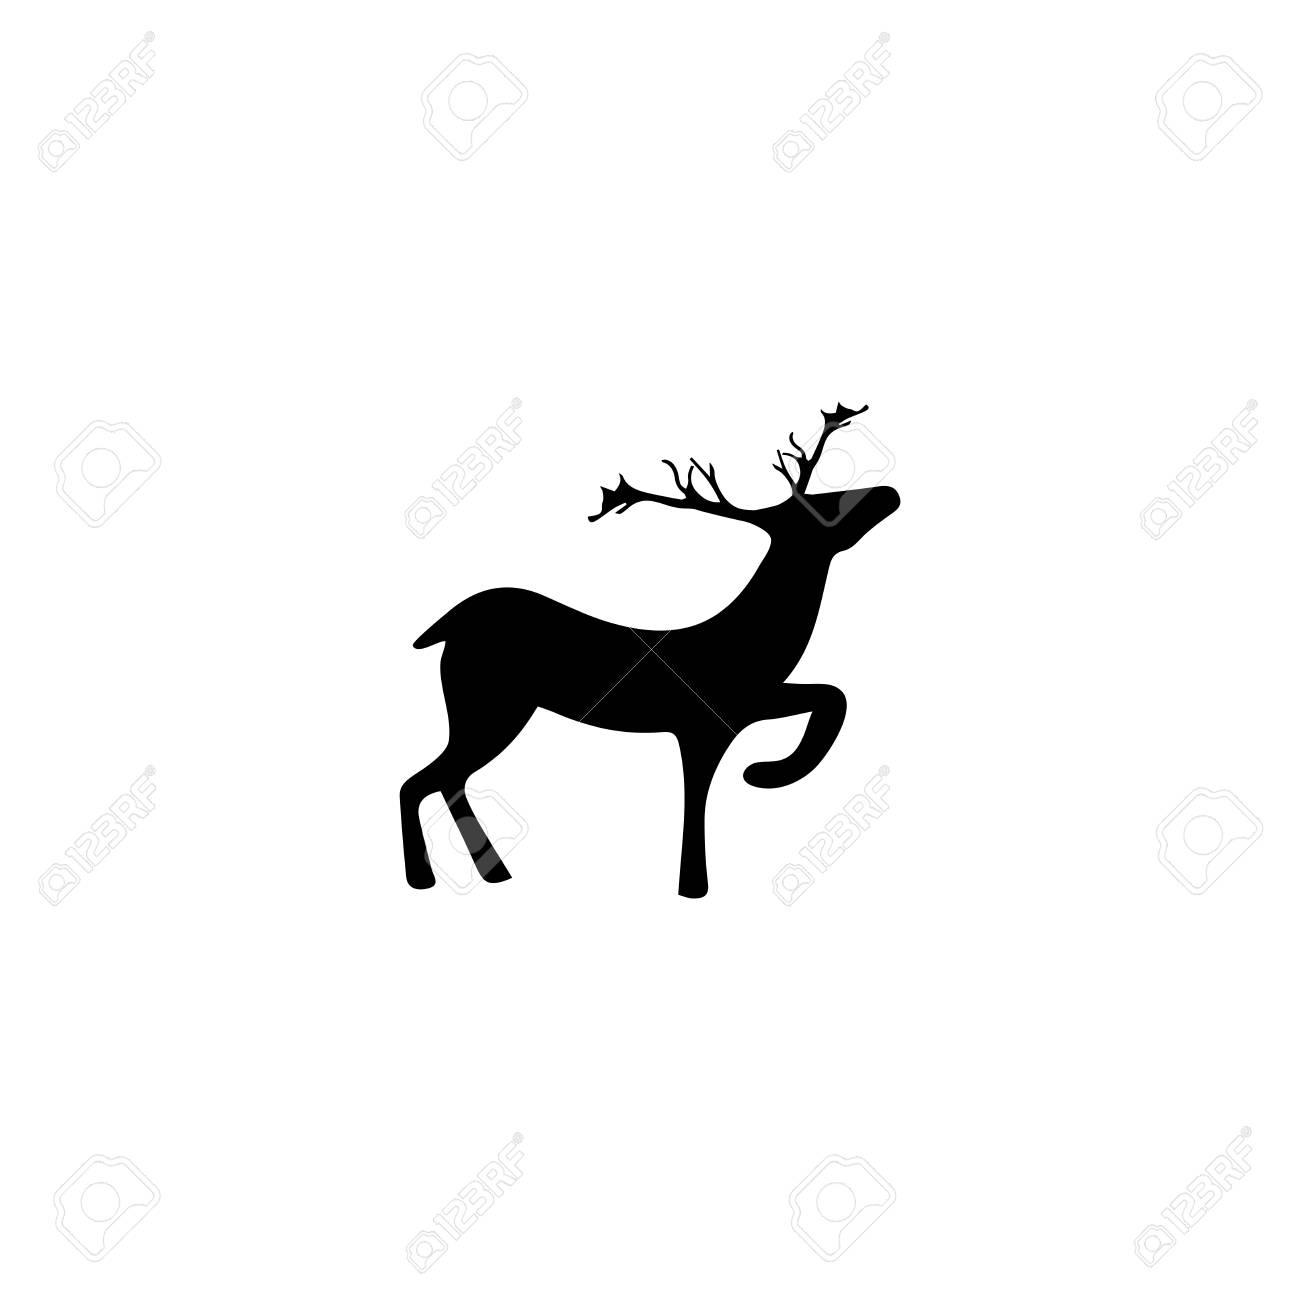 black deer on white background fashion graphic design modern